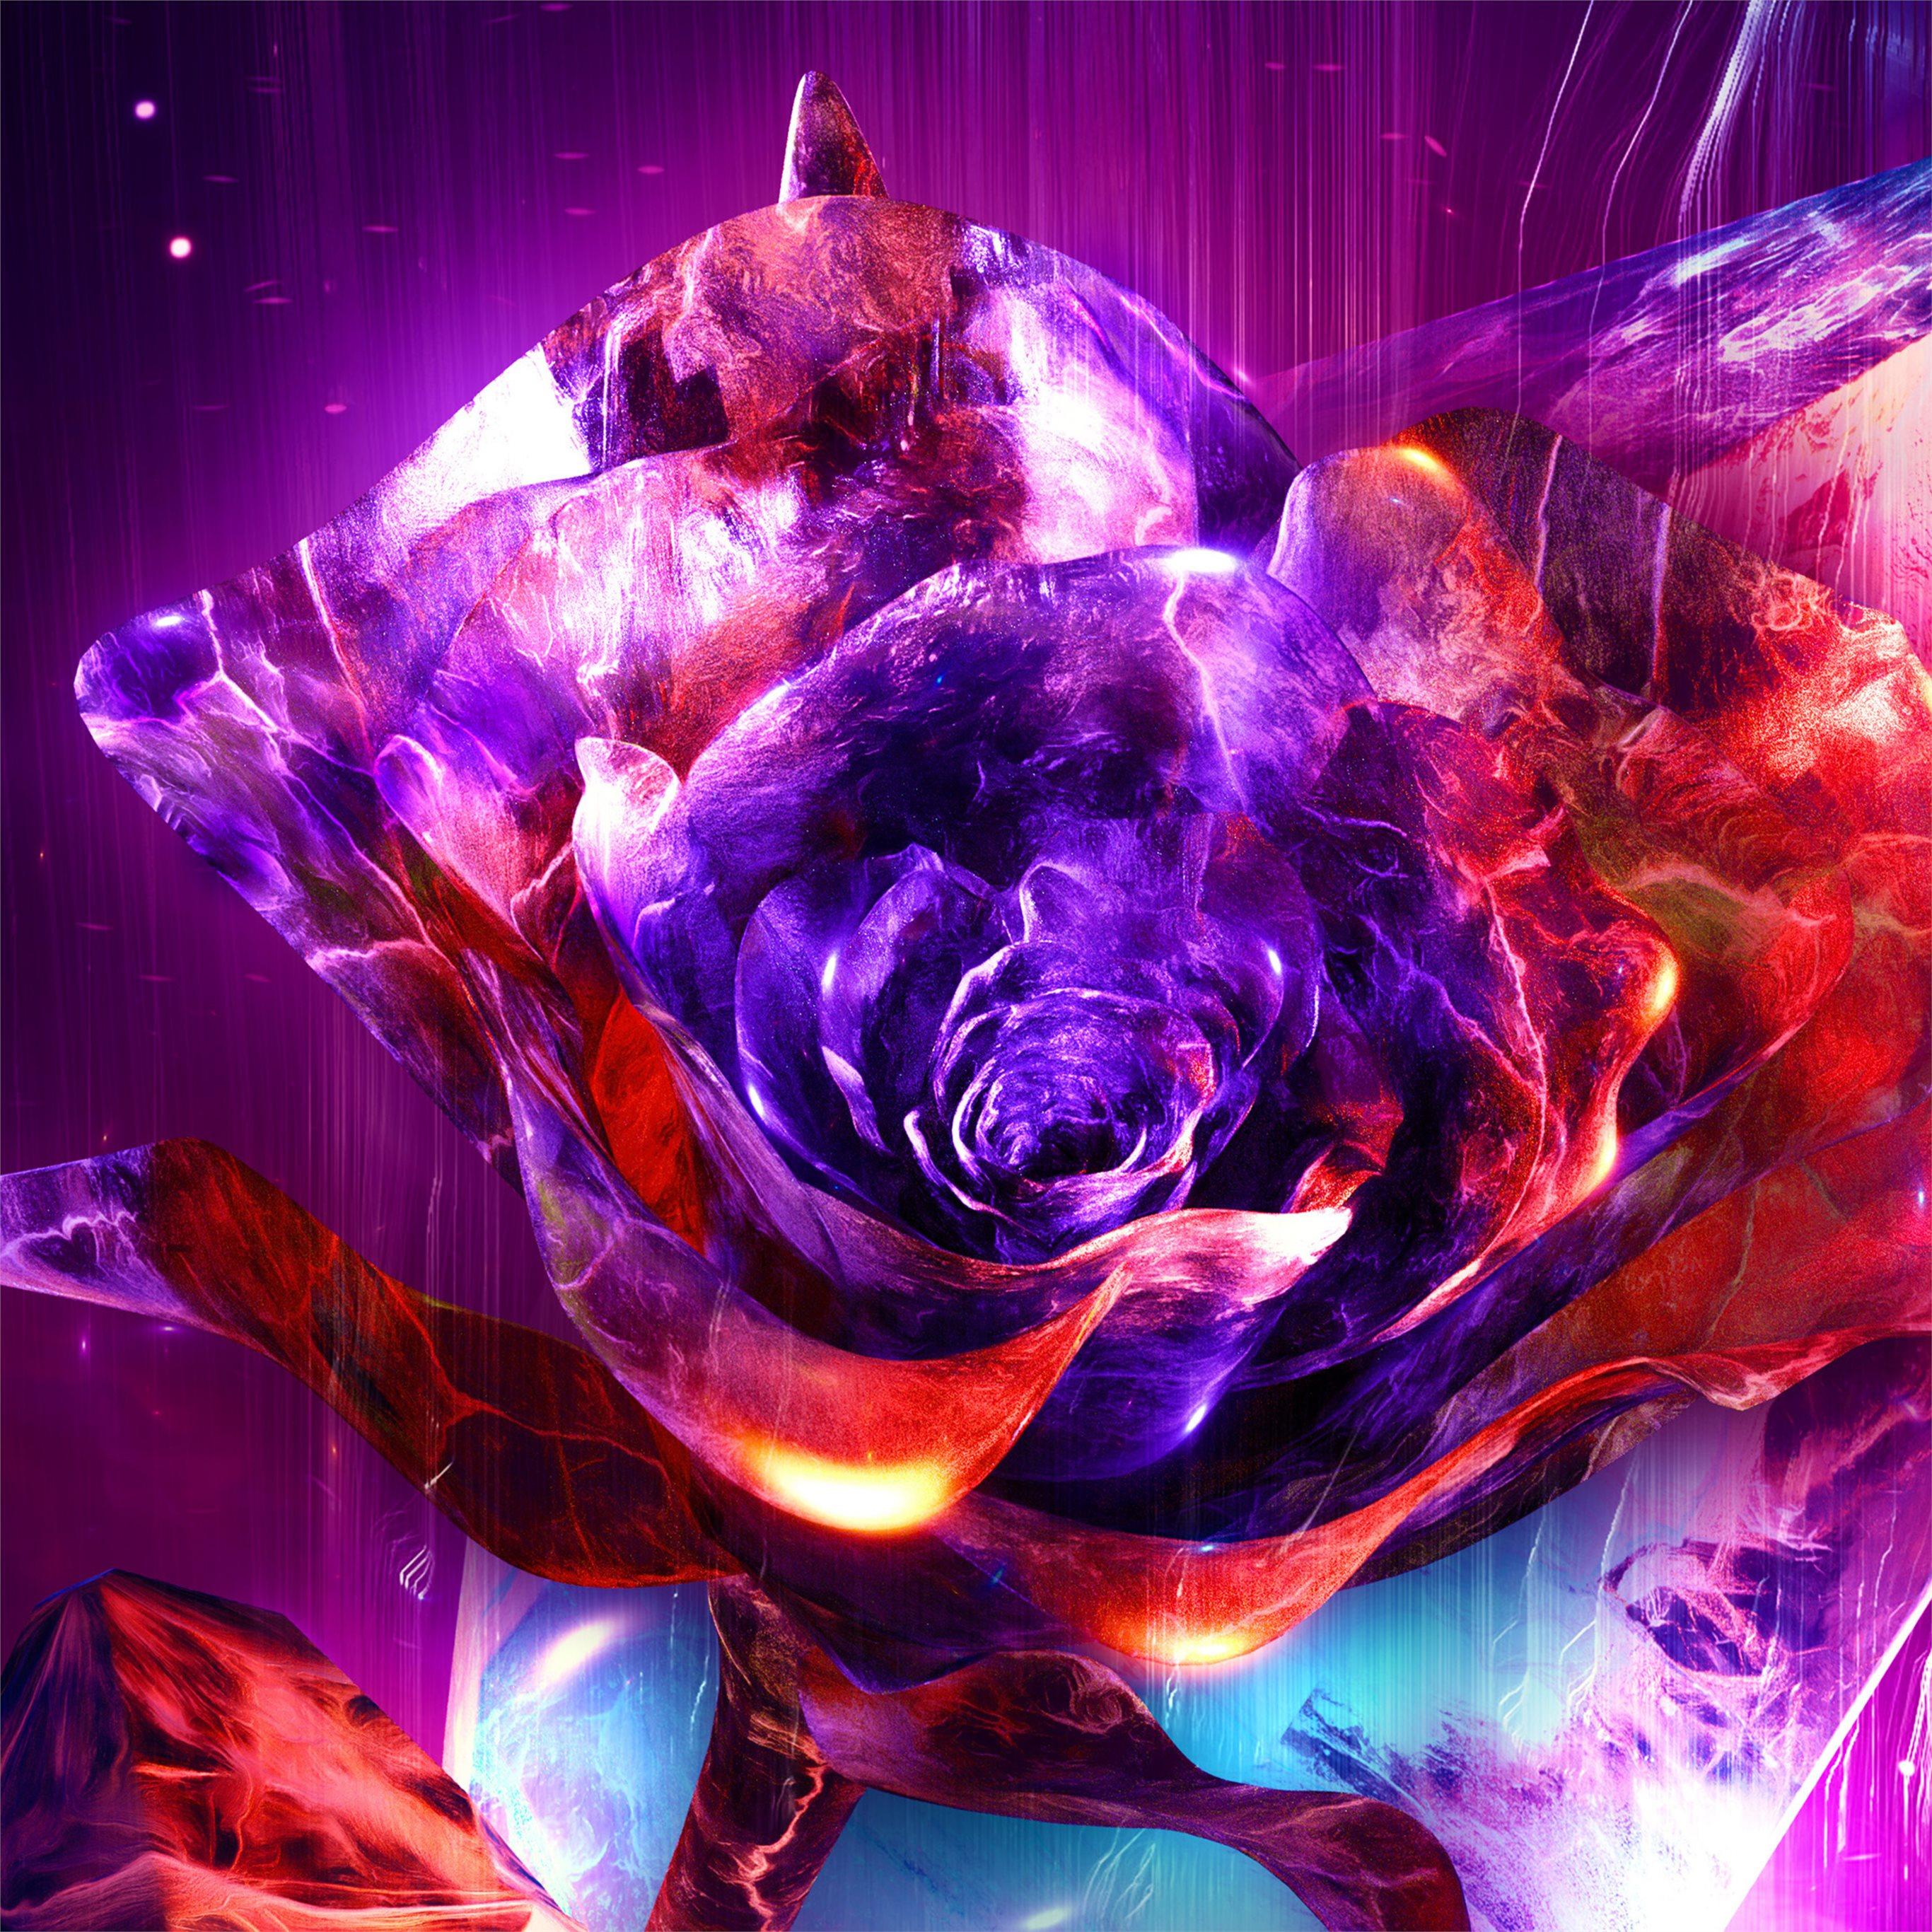 Rose Abstract 4k IPad Air Wallpapers Free Download